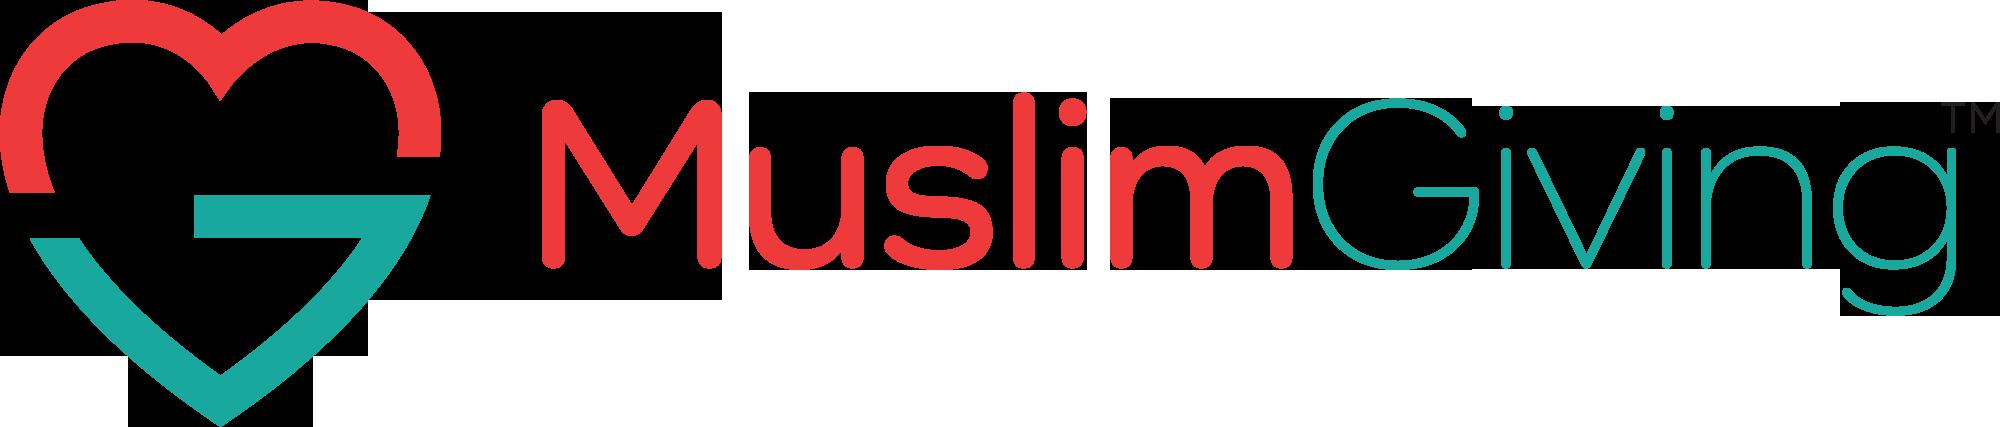 Muslim Giving Logo